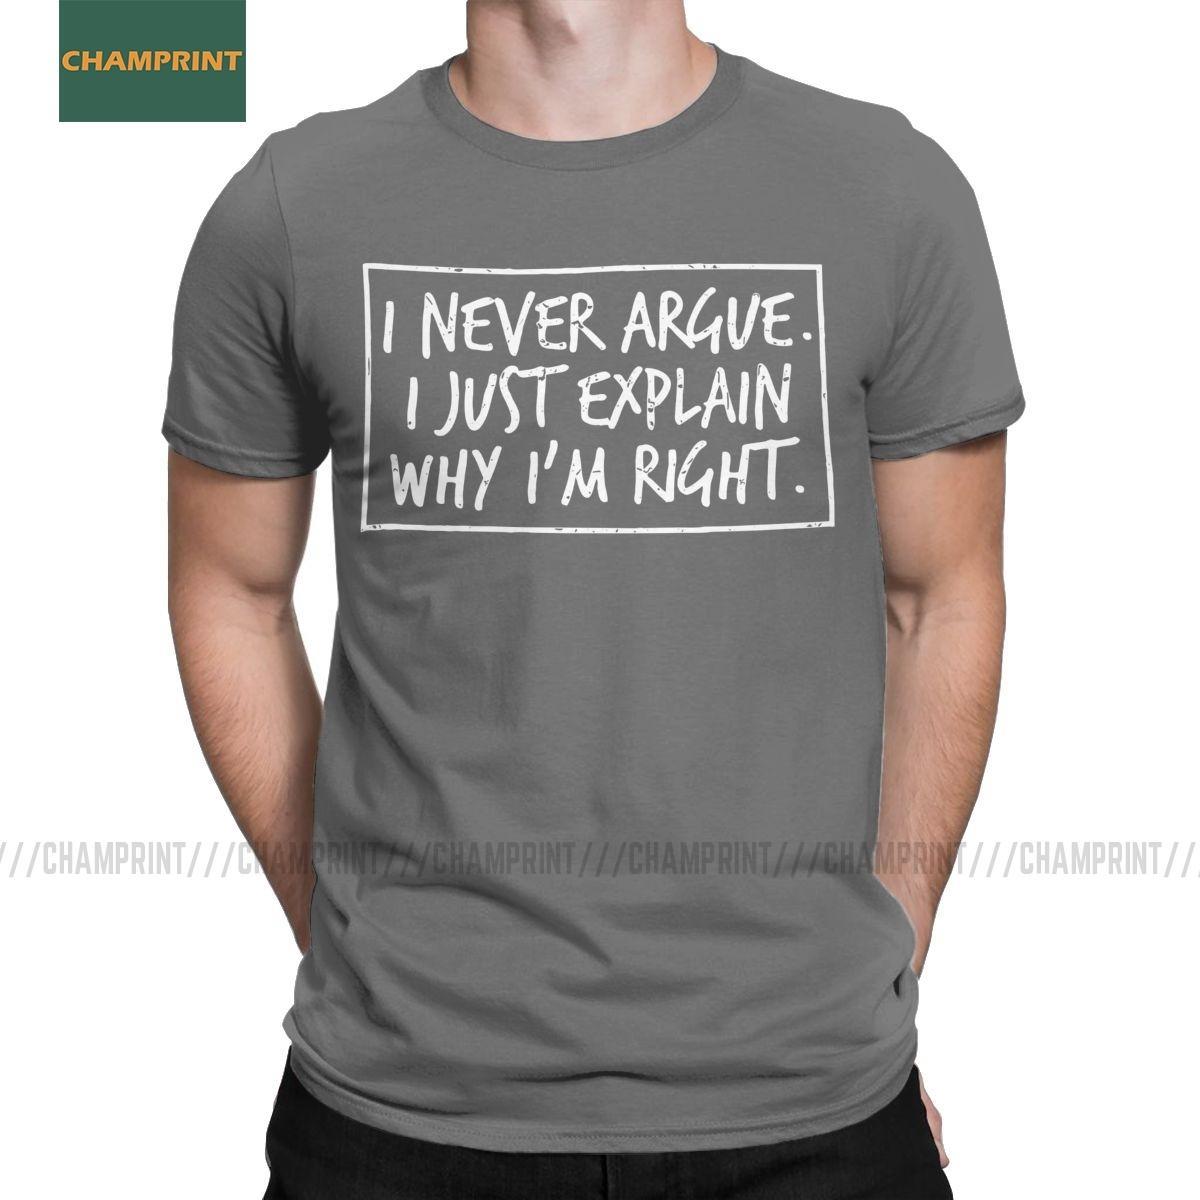 Homens T-Shirts Downton Abbey Violet Crawley Arrefecer Pure Cotton T manga curta viúva Maggie Smith Inglaterra Londres Camisetas